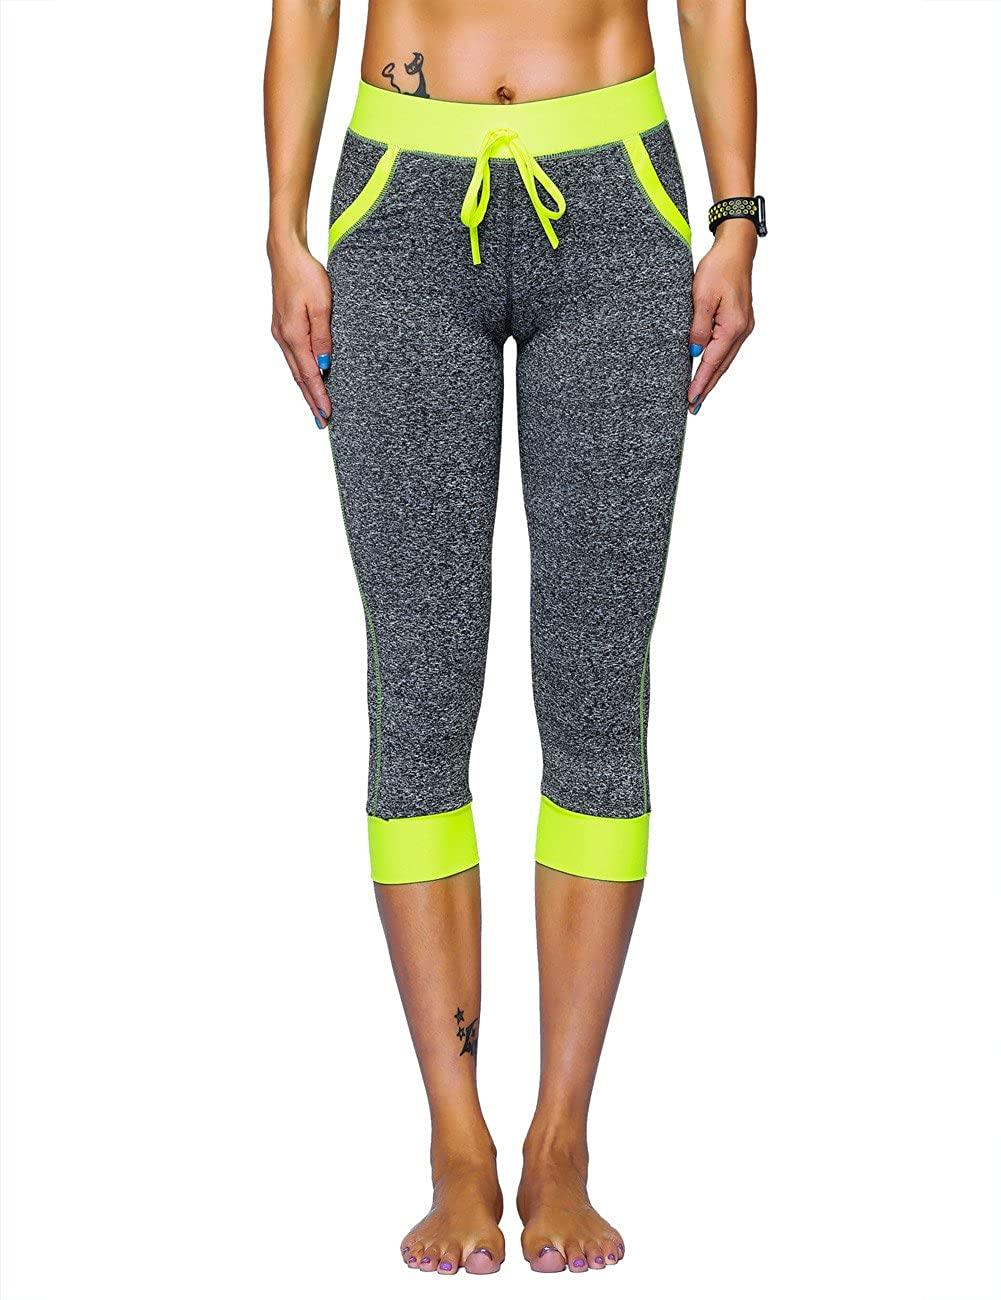 Nonwe Women's Yoga Leggings Capris Pants Workout Fitness Tights